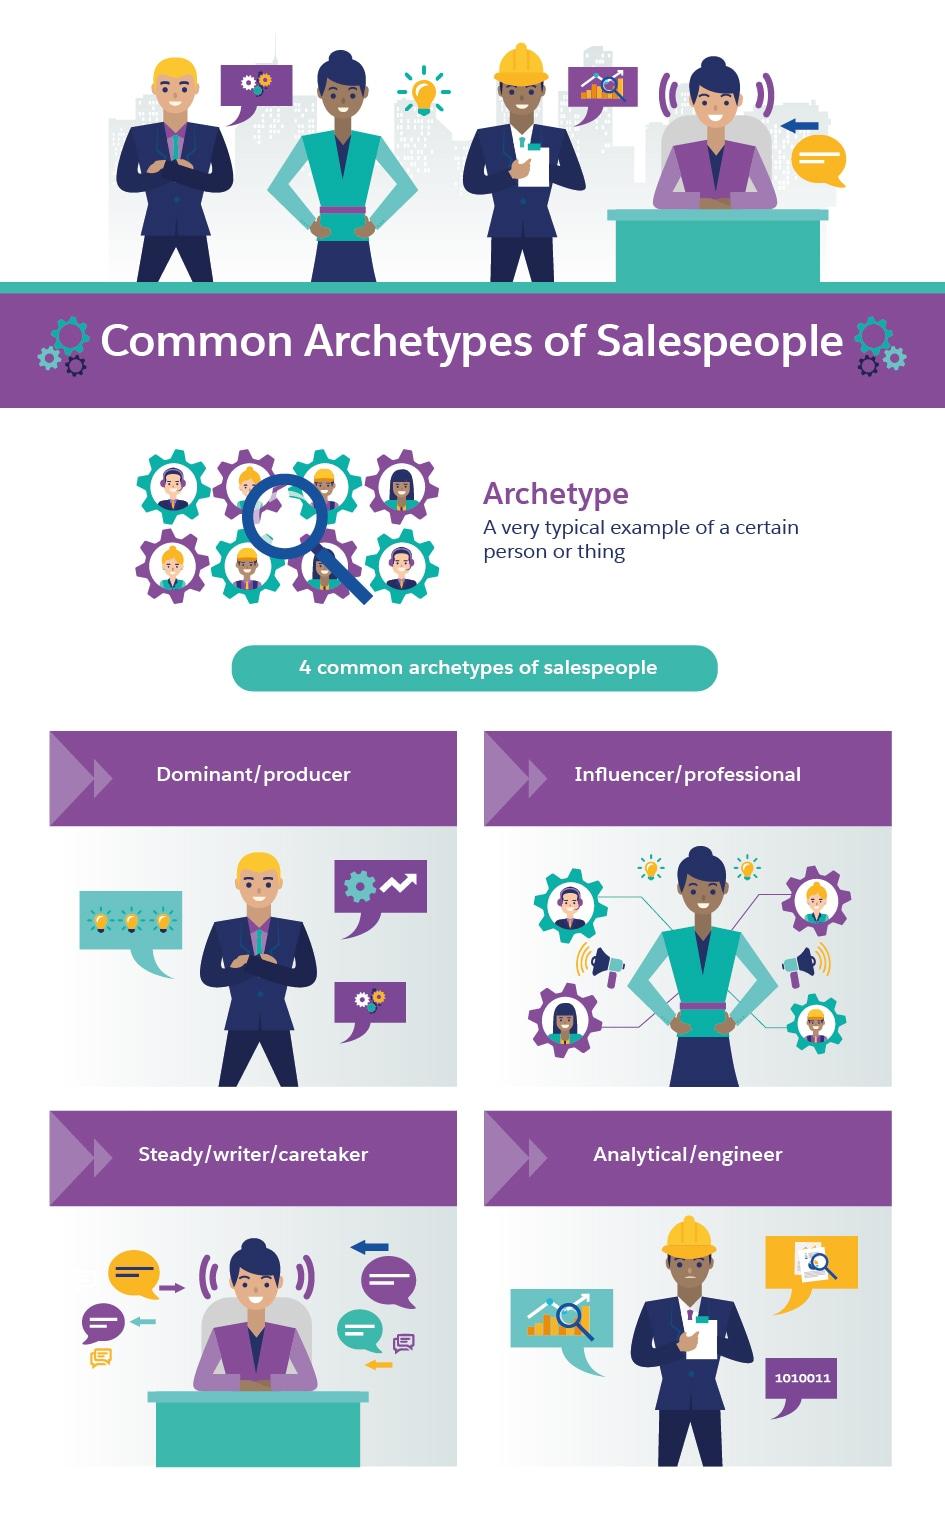 Common Archetypes of Salespeople